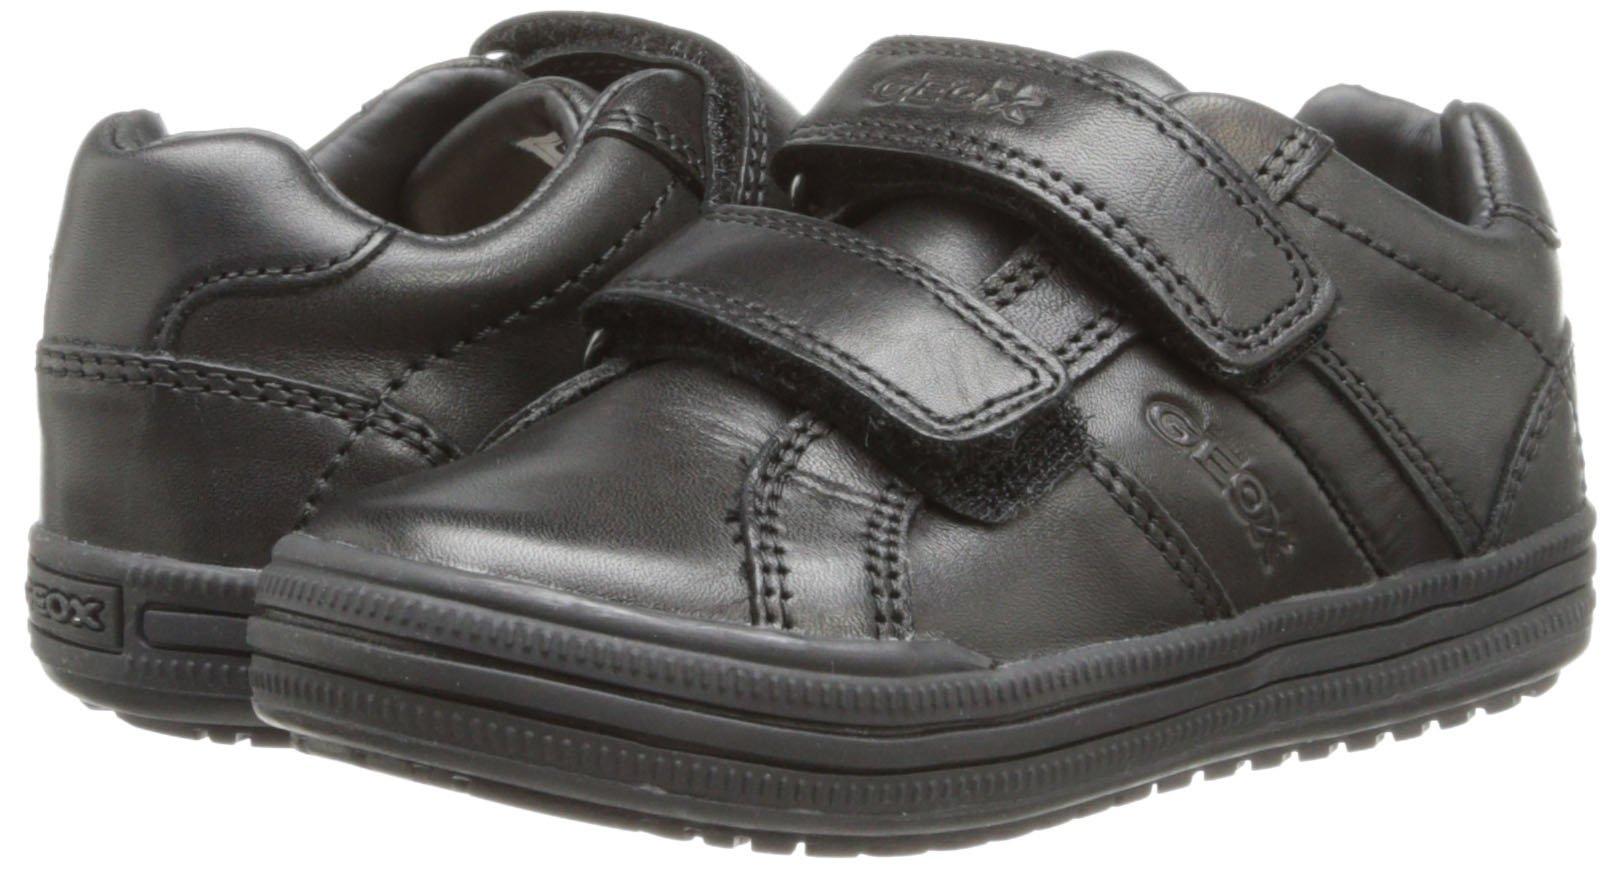 Geox JR Elvis Uniform Shoe (Toddler/Little Kid/Big Kid),Black,35 EU (3.5 M US Big Kid) by Geox (Image #6)